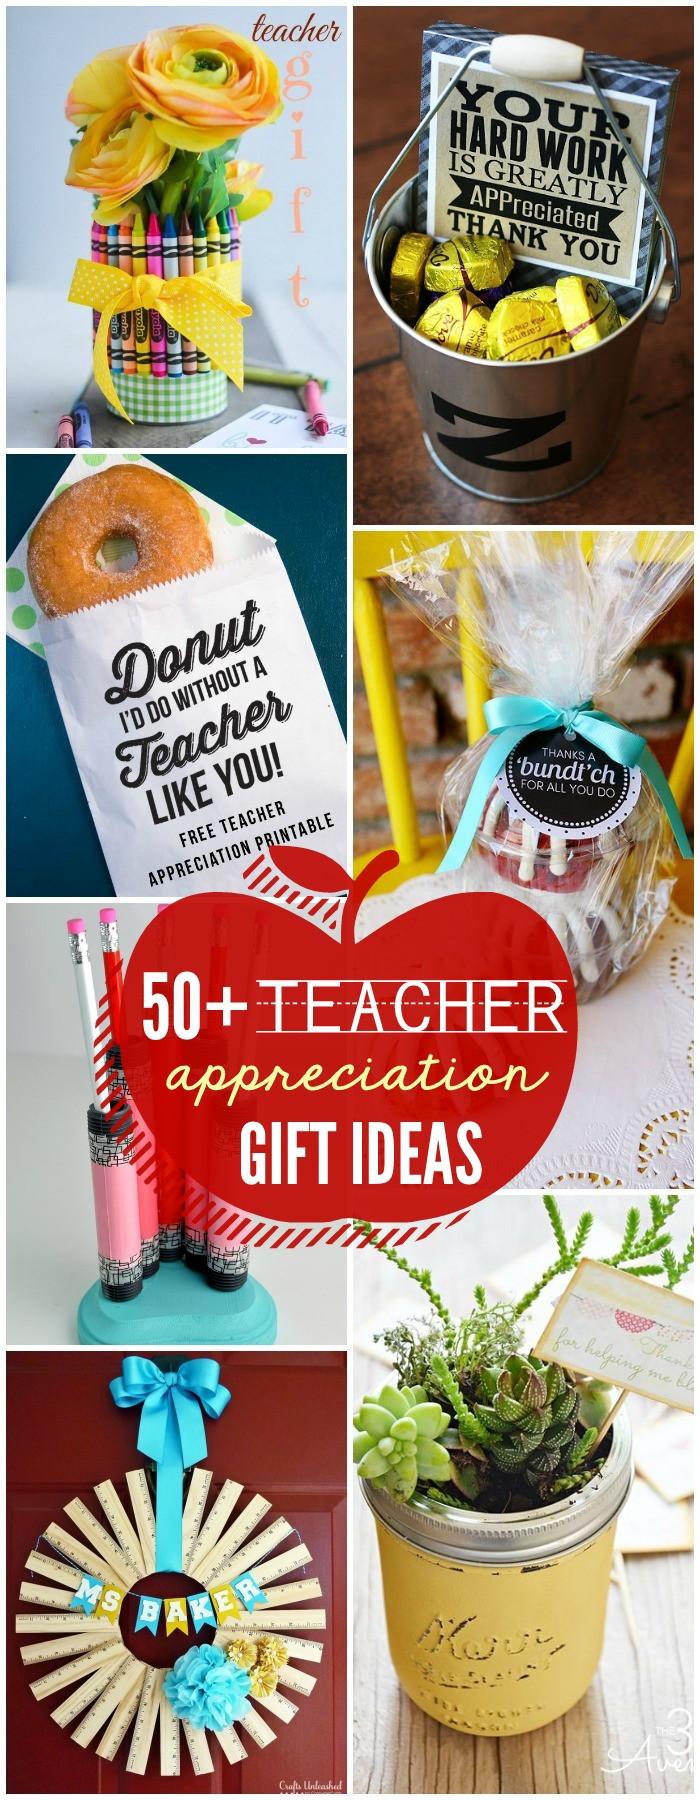 Best ideas about Teachers Appreciation Gift Ideas . Save or Pin Teacher Appreciation Gift Ideas Now.